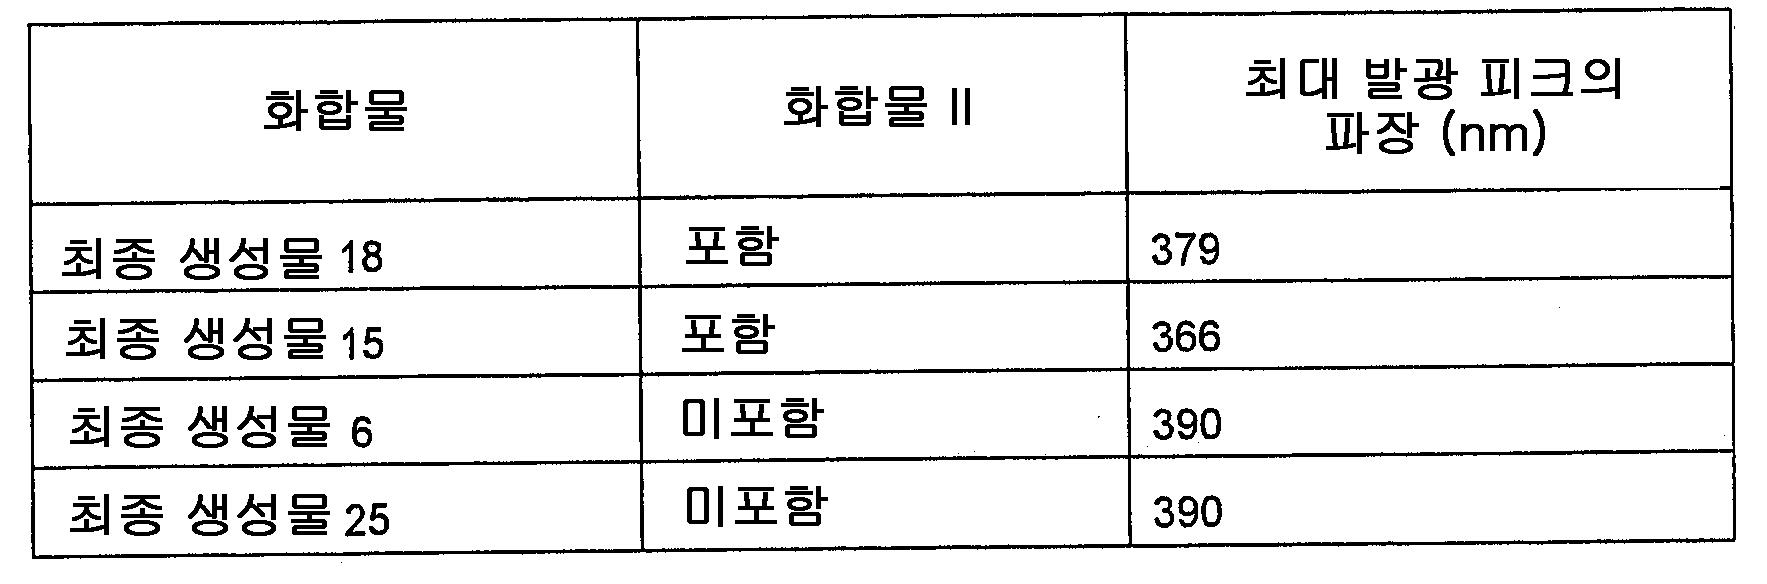 Figure 112010002231902-pat00152